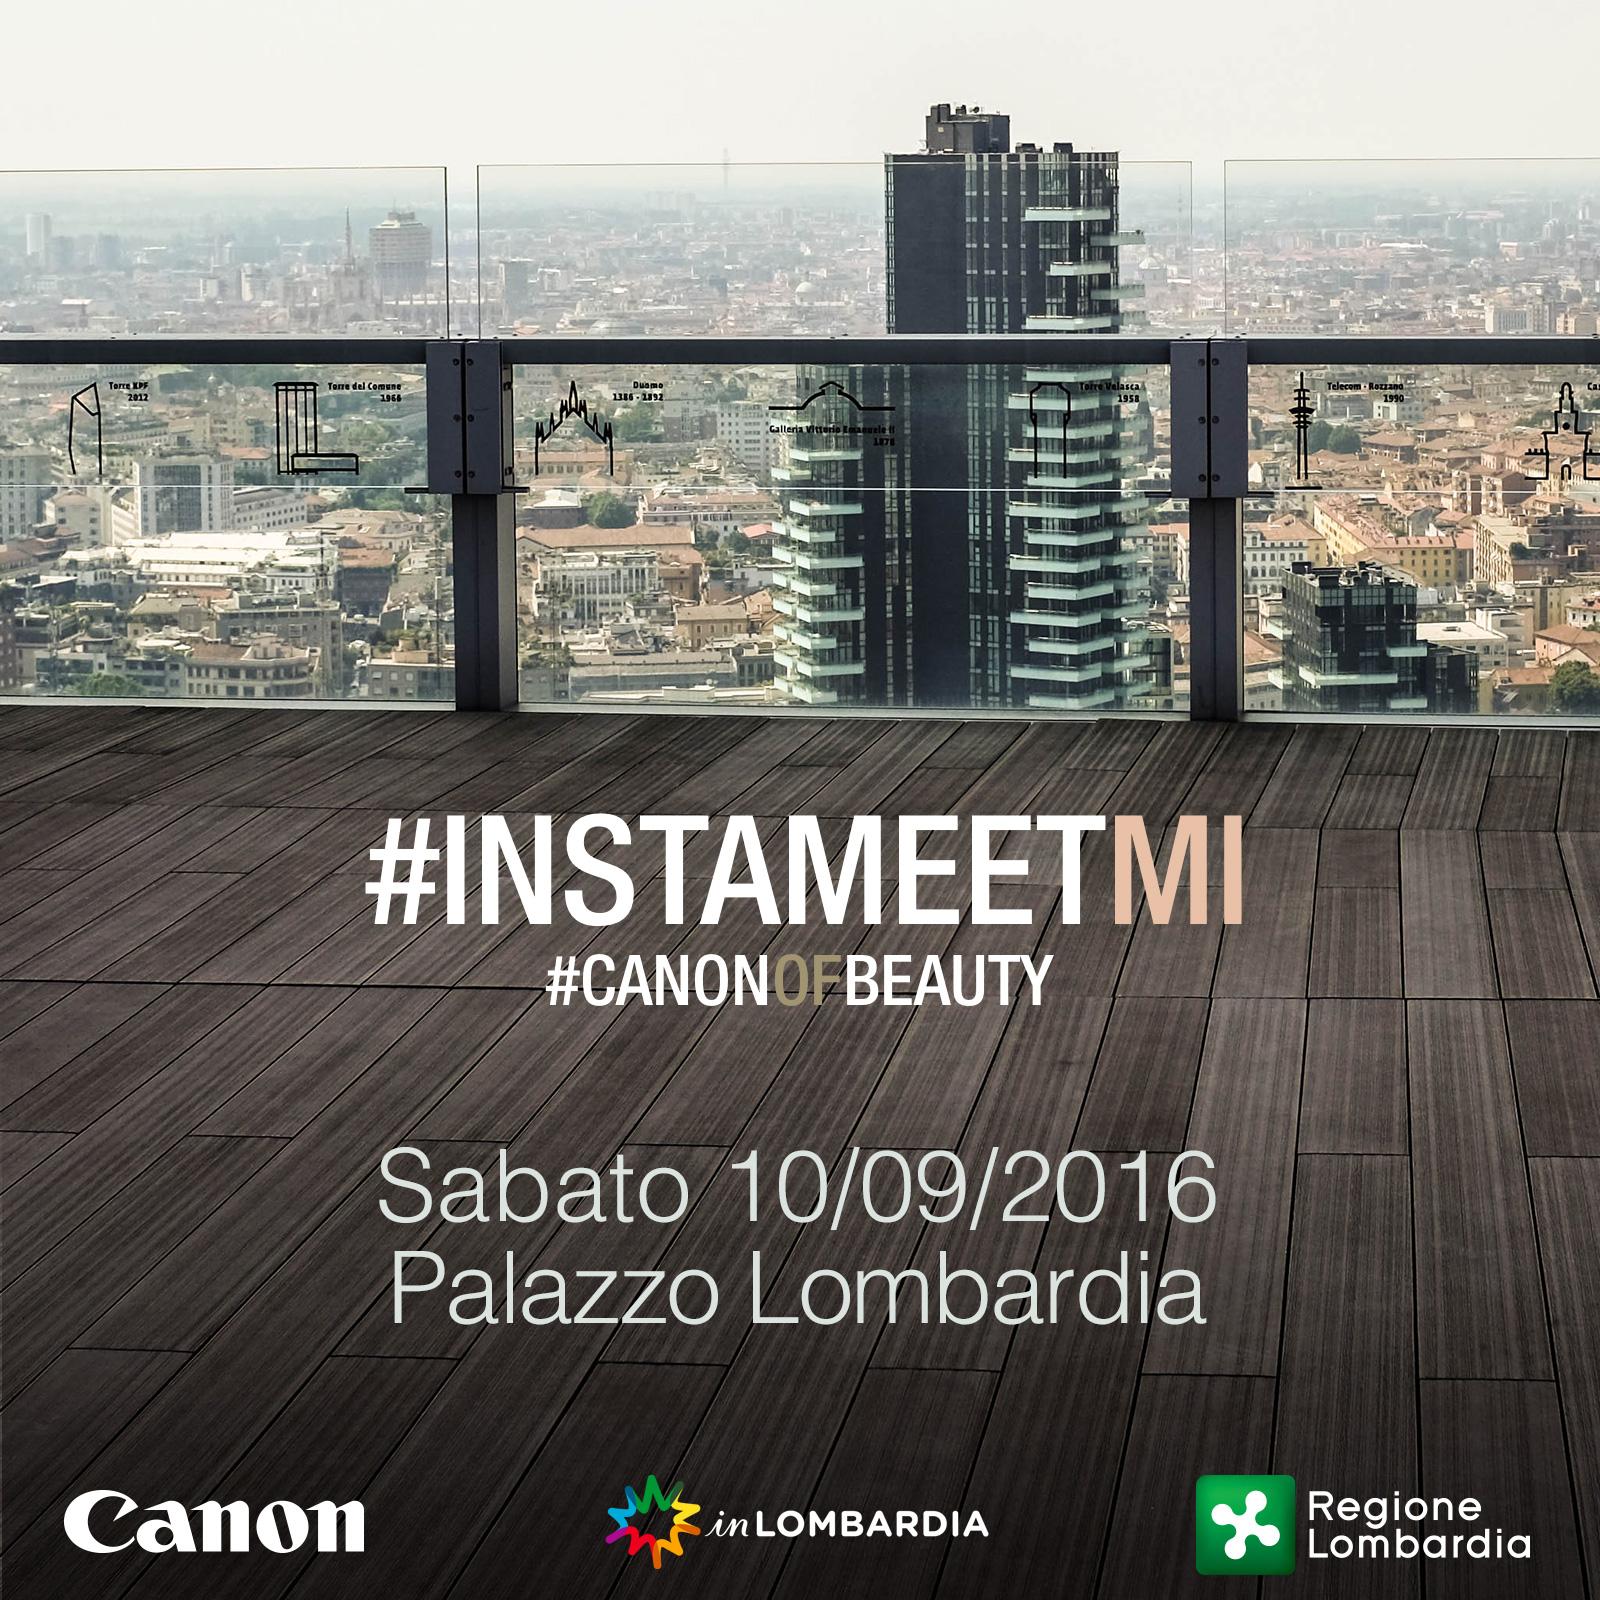 Un Instameet 38 Piani Sopra Milano Per Canonofbeauty